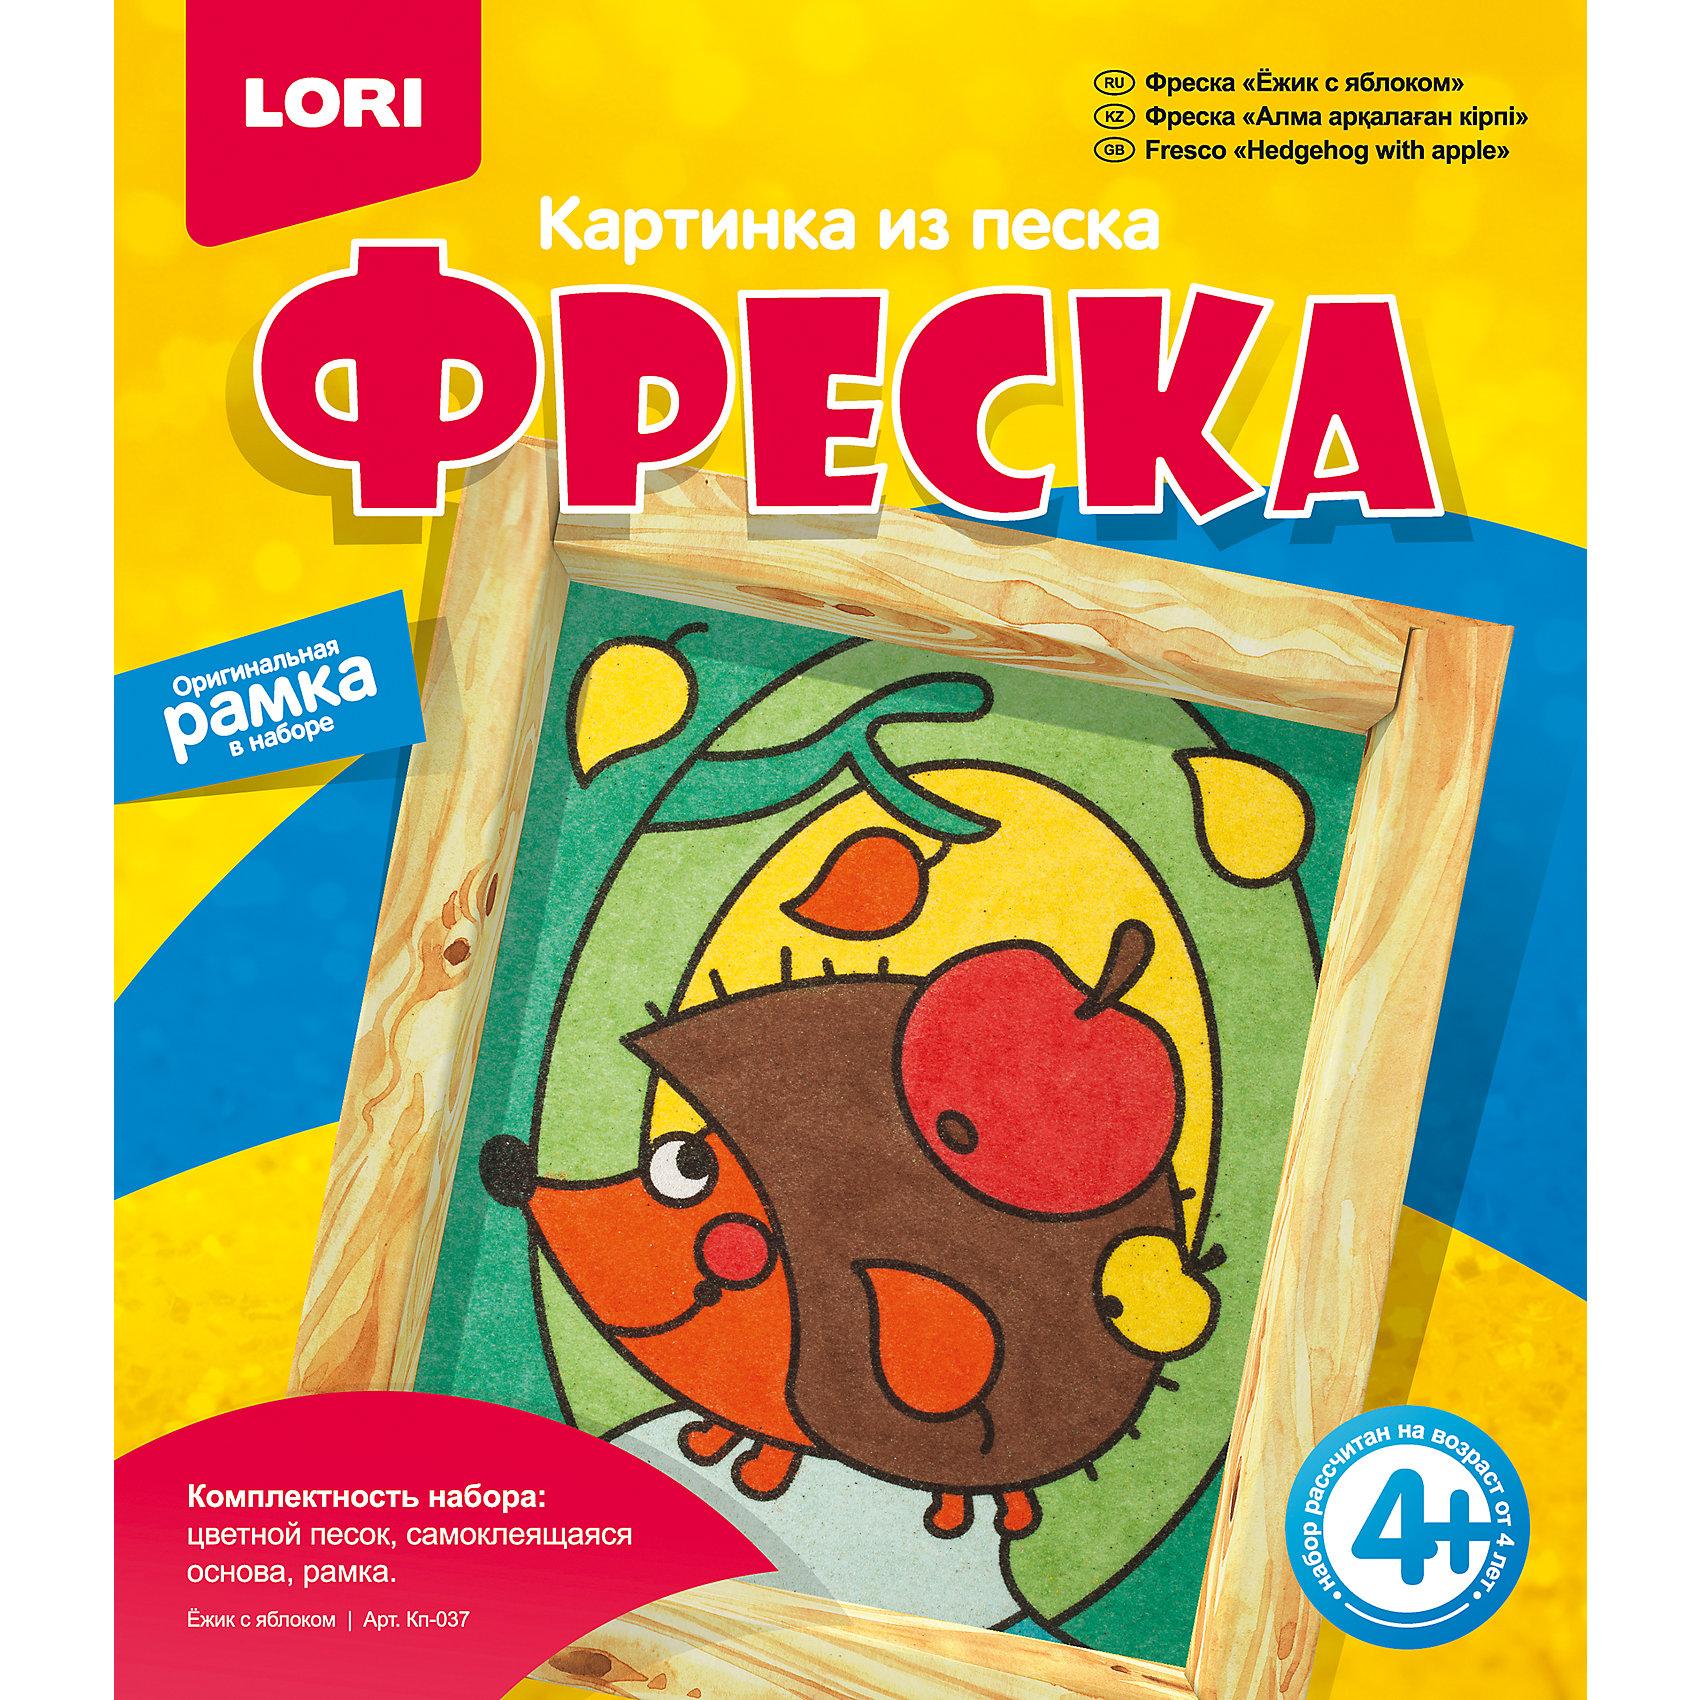 LORI Фреска, Картина из песка Ёжик с яблоком lori фоторамки из гипса на клумбе